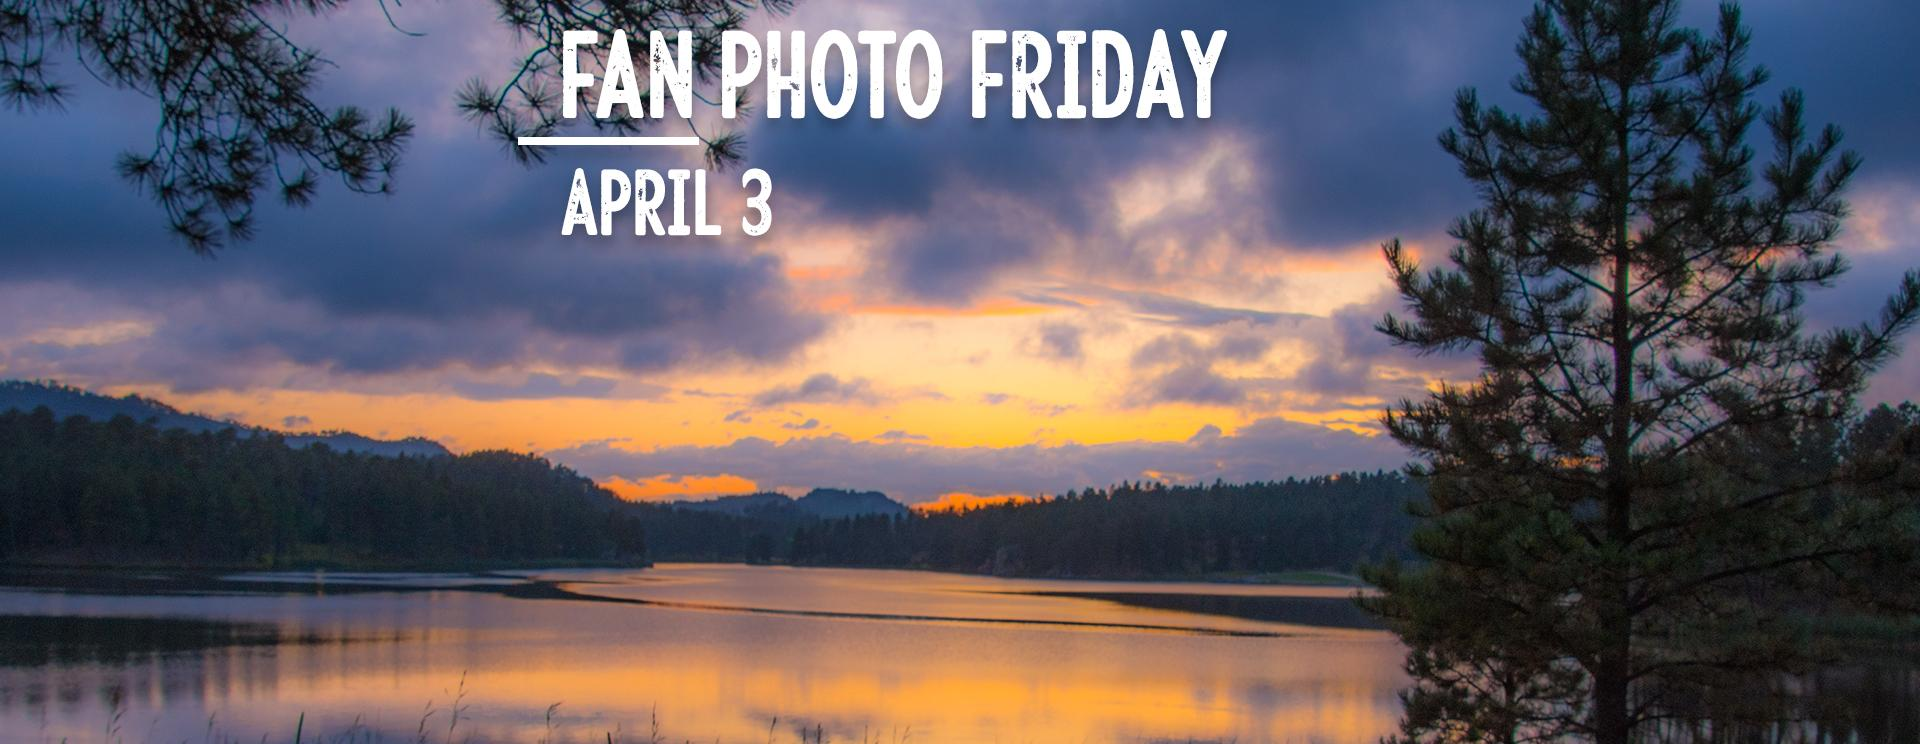 Fan Photo Friday | April 3, 2020